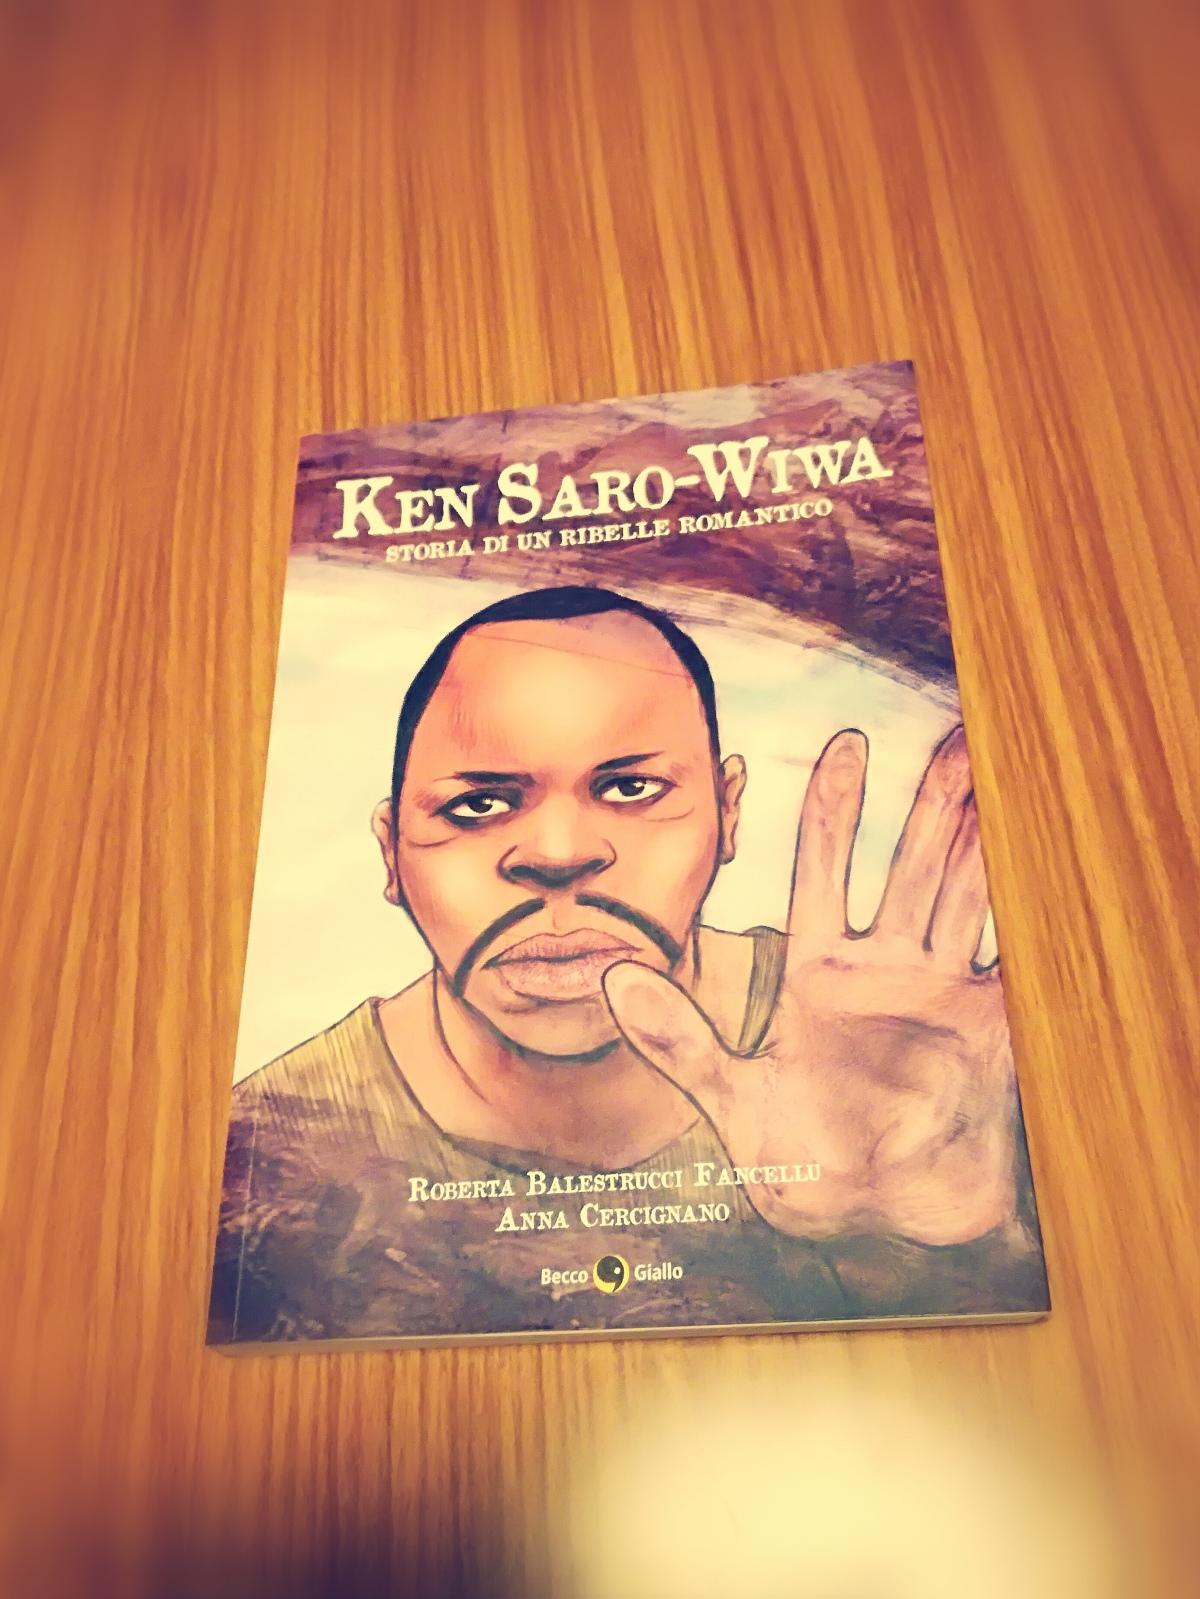 KEN SARO-WIWA: storia di un ribelleromantico